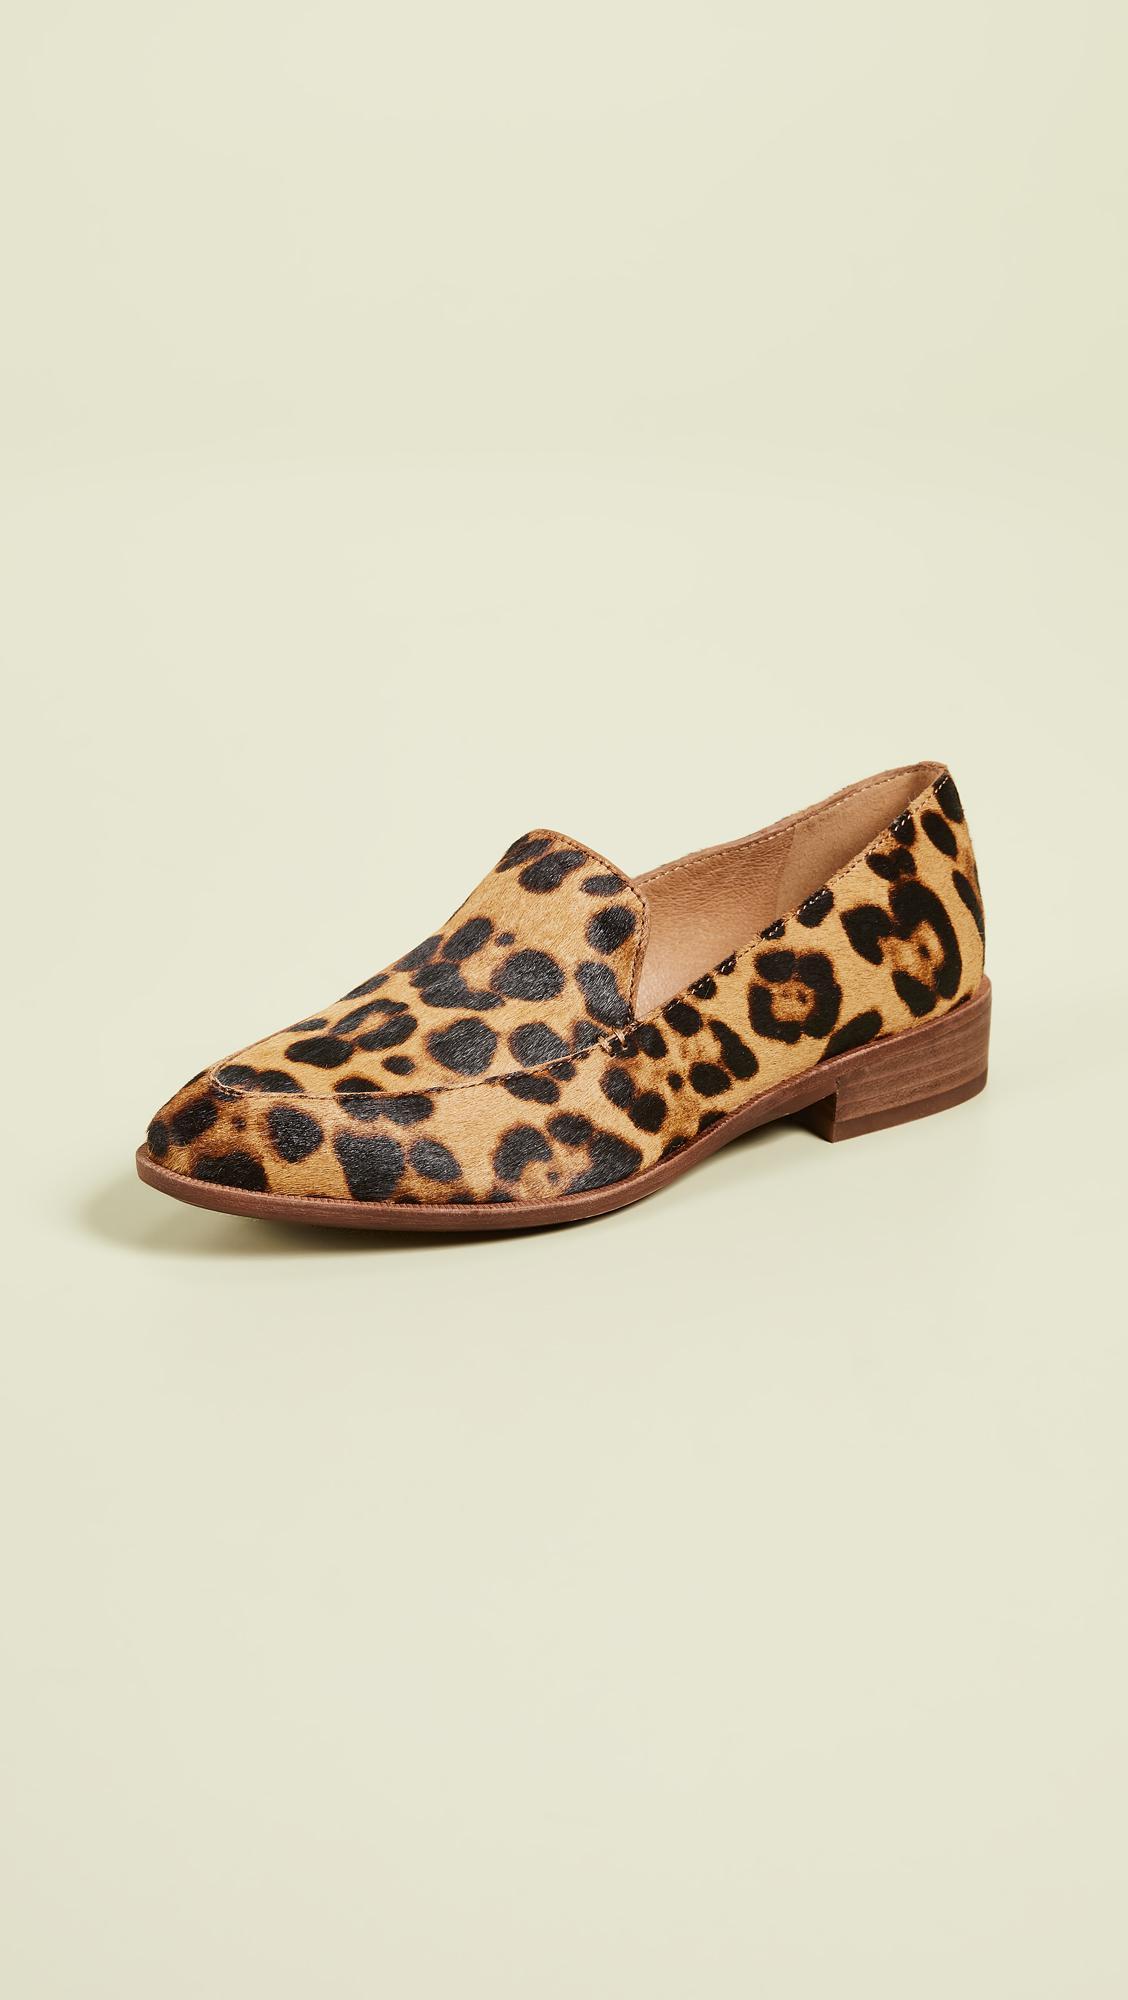 ee66343e17e Madewell. Women s Frances Leopard Loafers